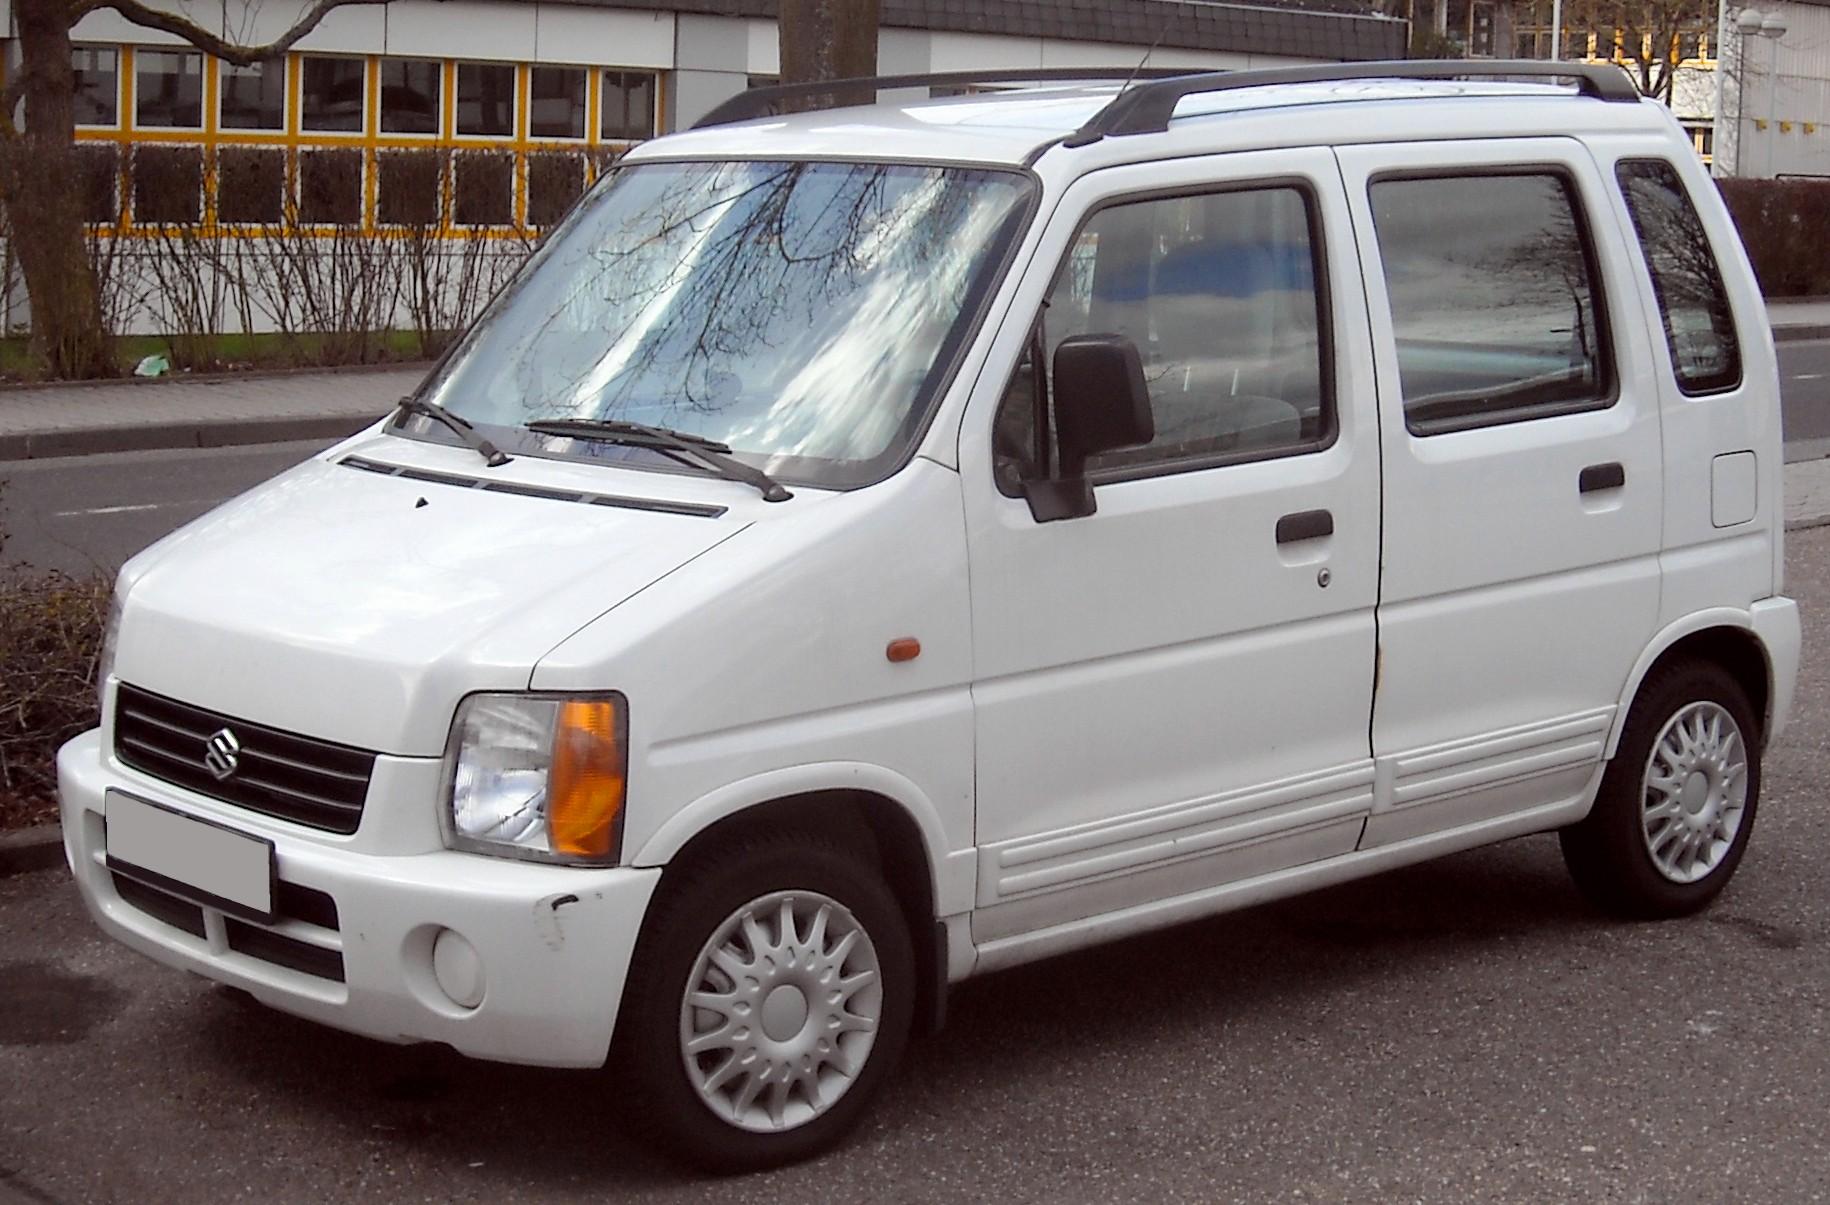 File:Suzuki Wagon R+ front 20100402.jpg - Wikimedia Commons